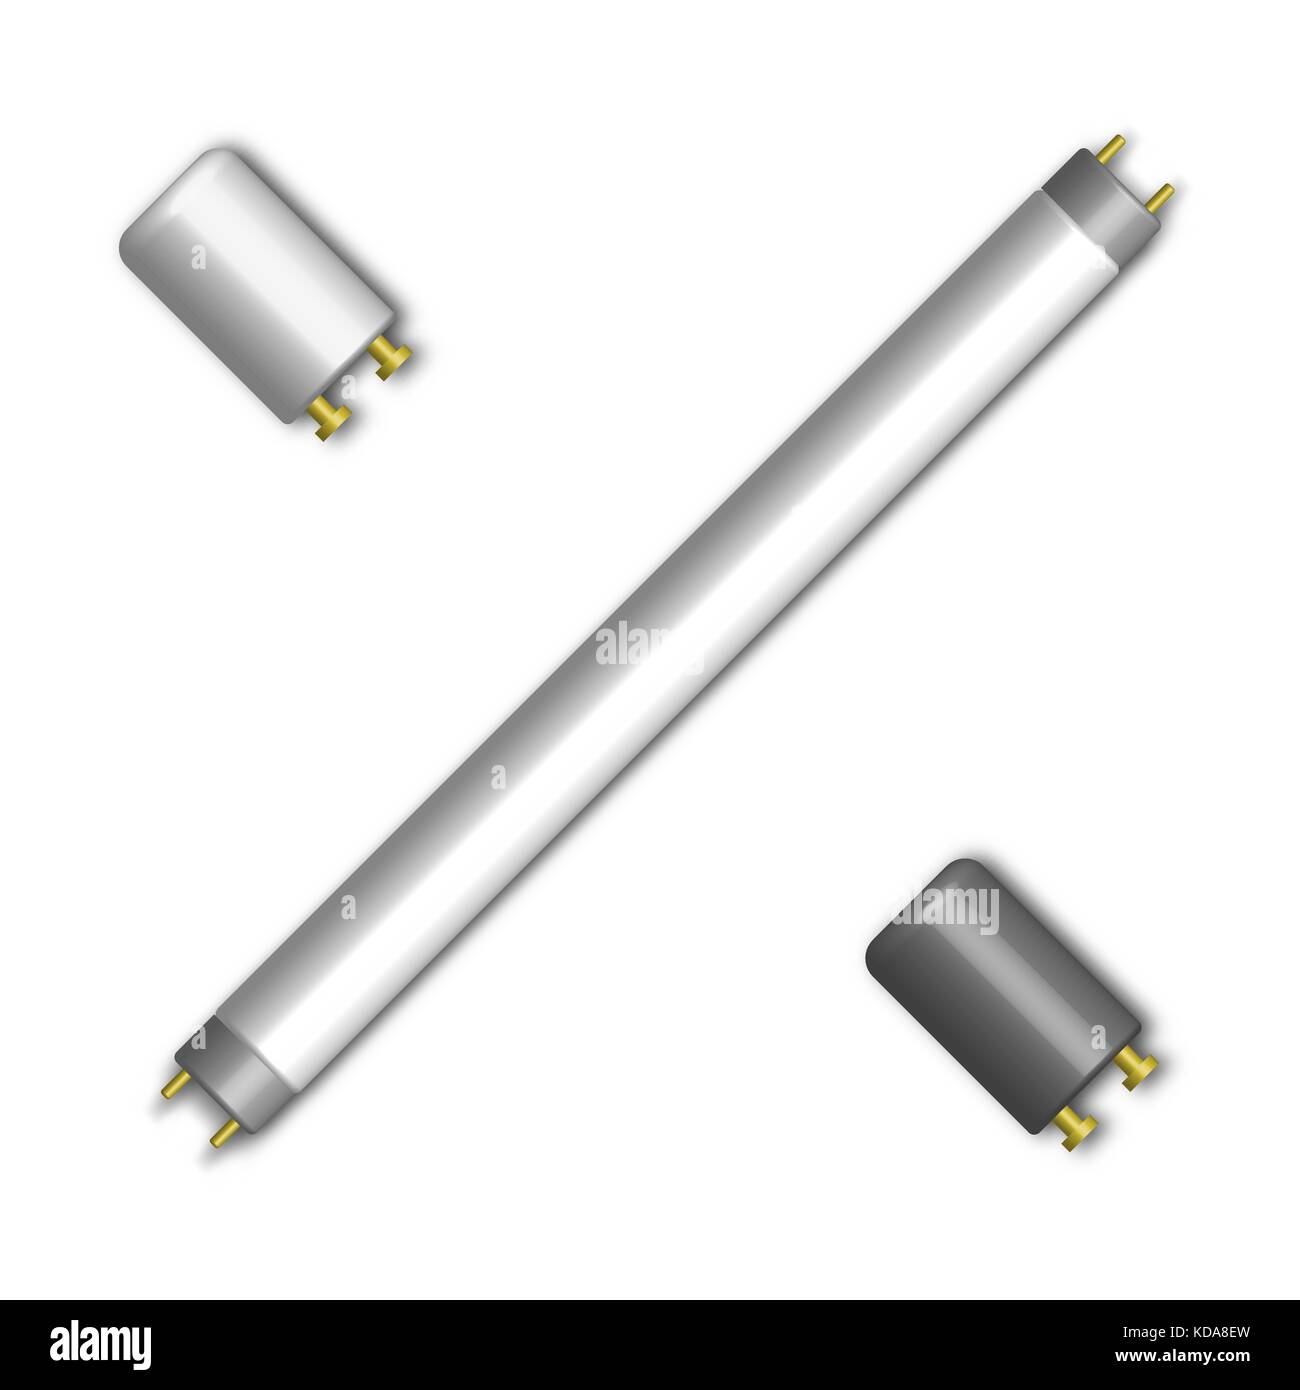 Fluorescent Light Elements: Mercury Vapor Lamp Stock Photos & Mercury Vapor Lamp Stock